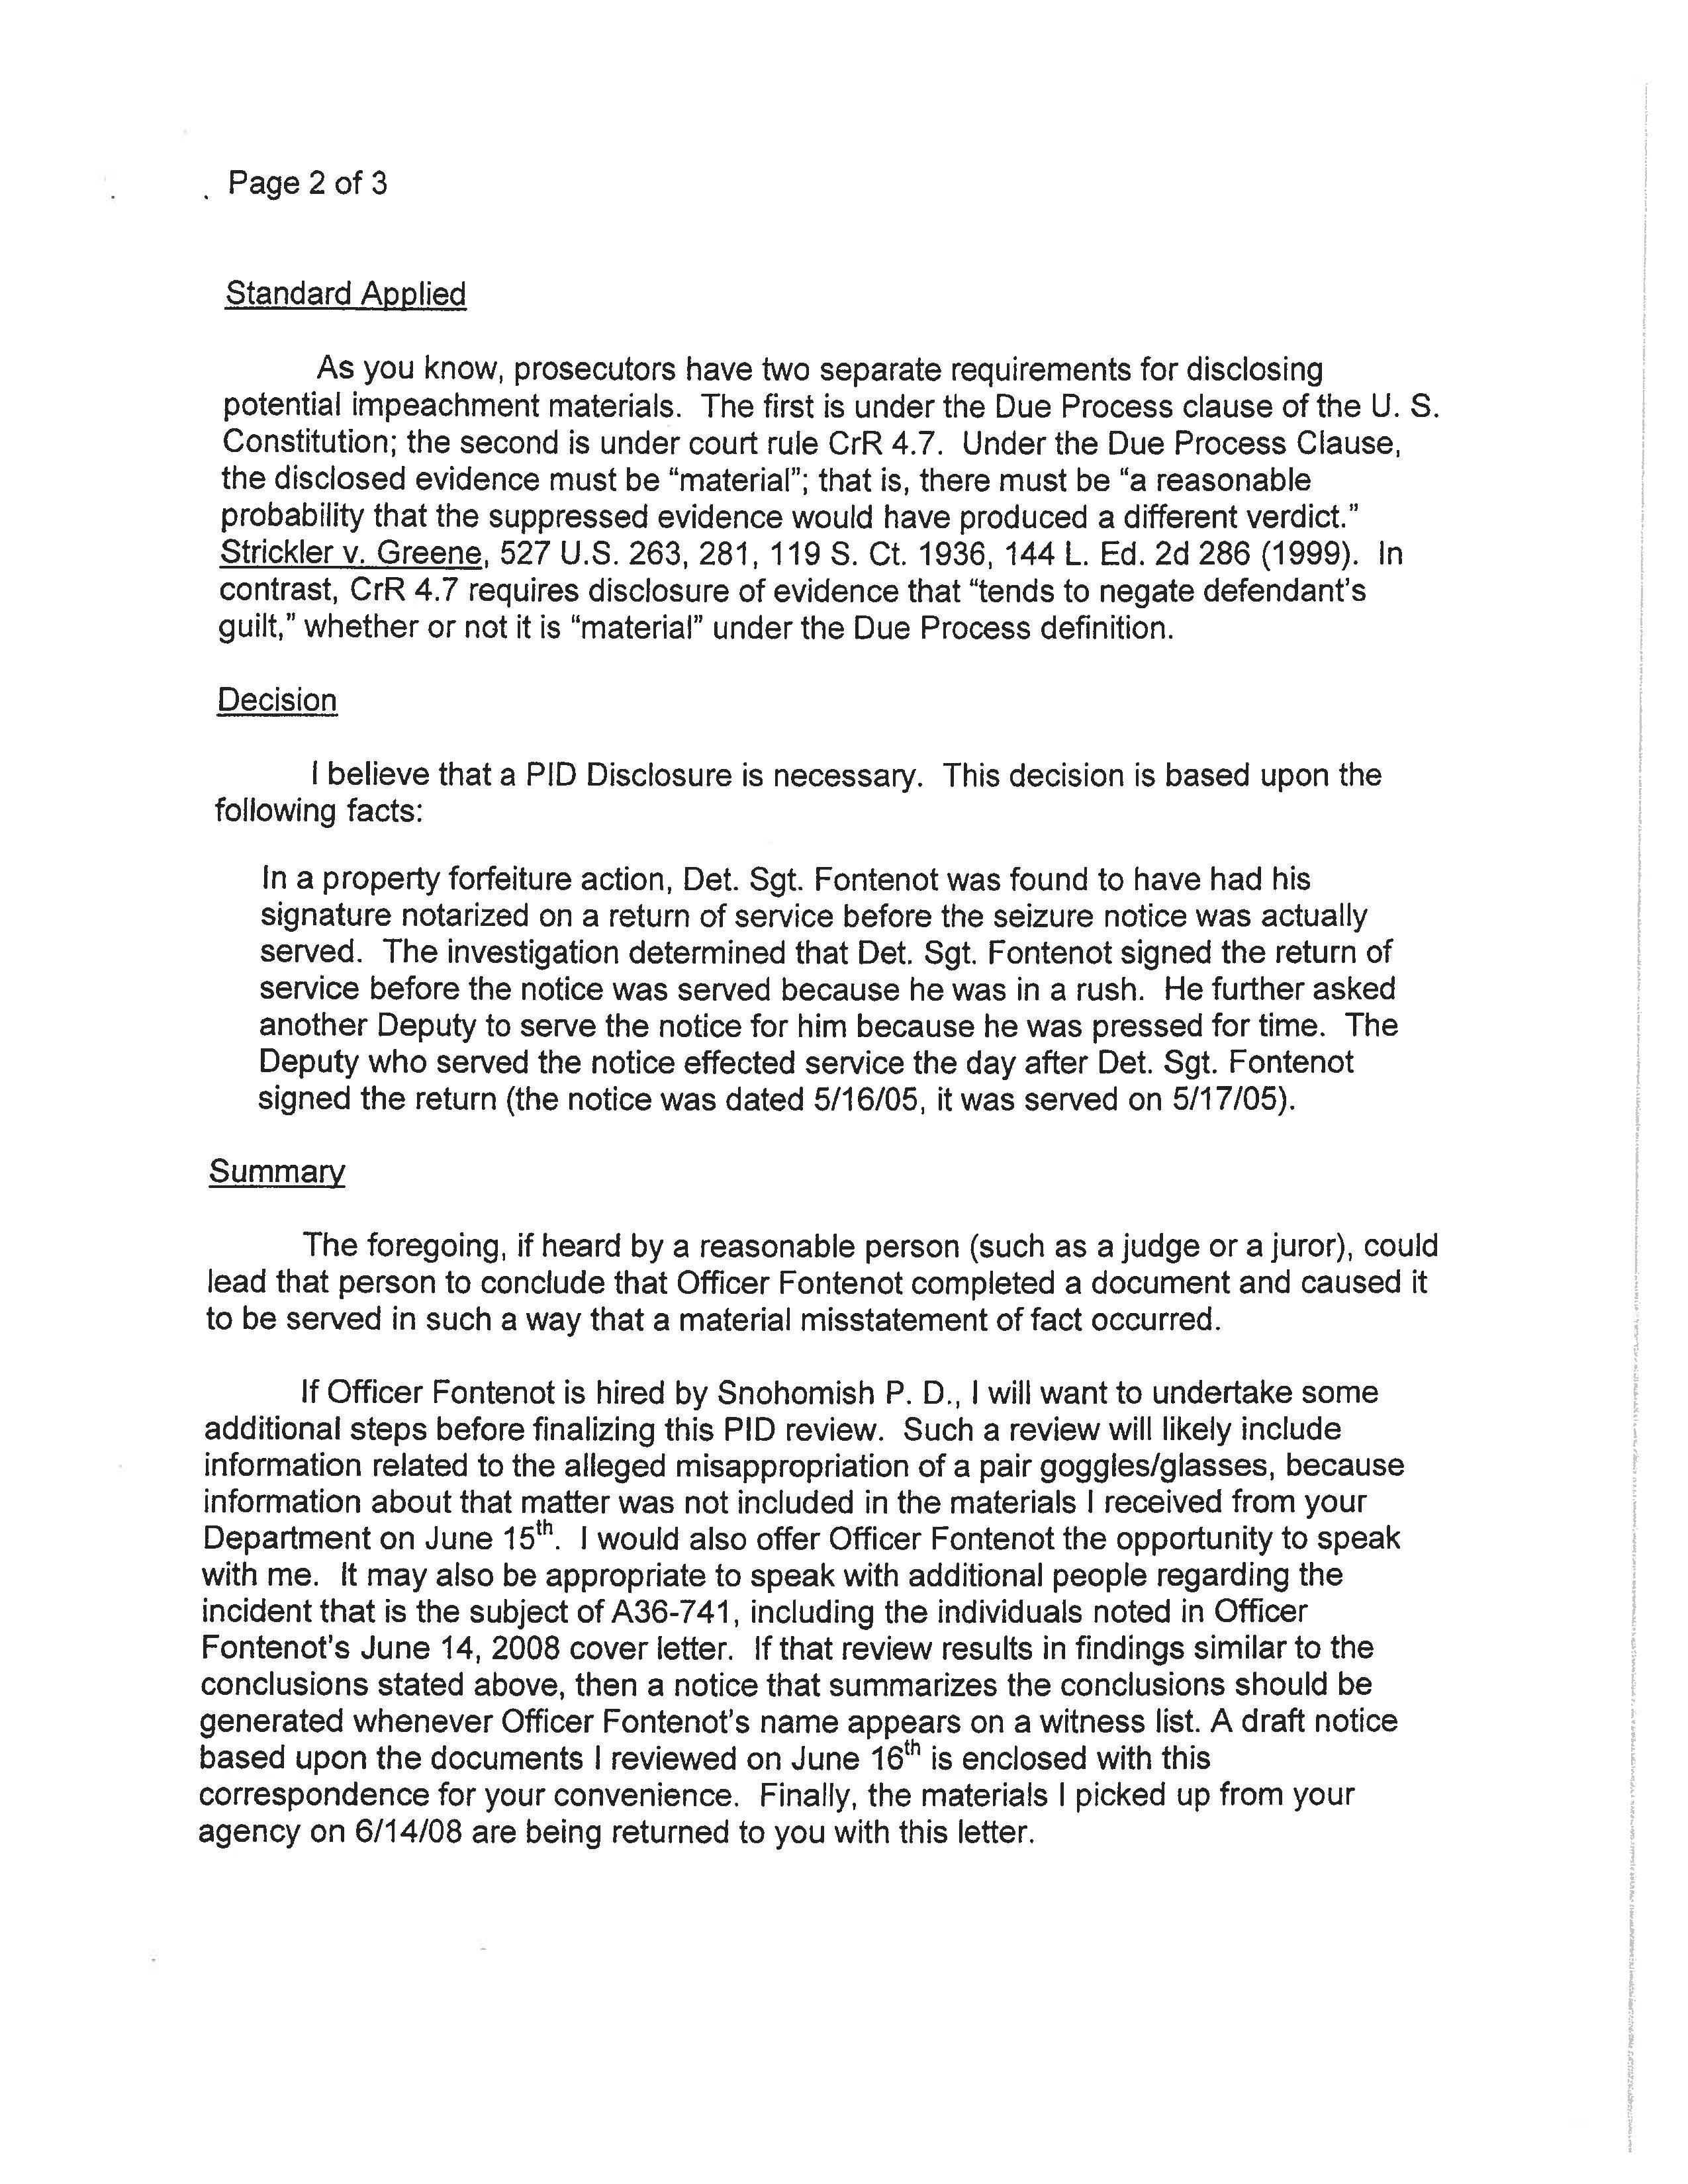 Brady Cop David Fontenot Evidence 1_Page_2